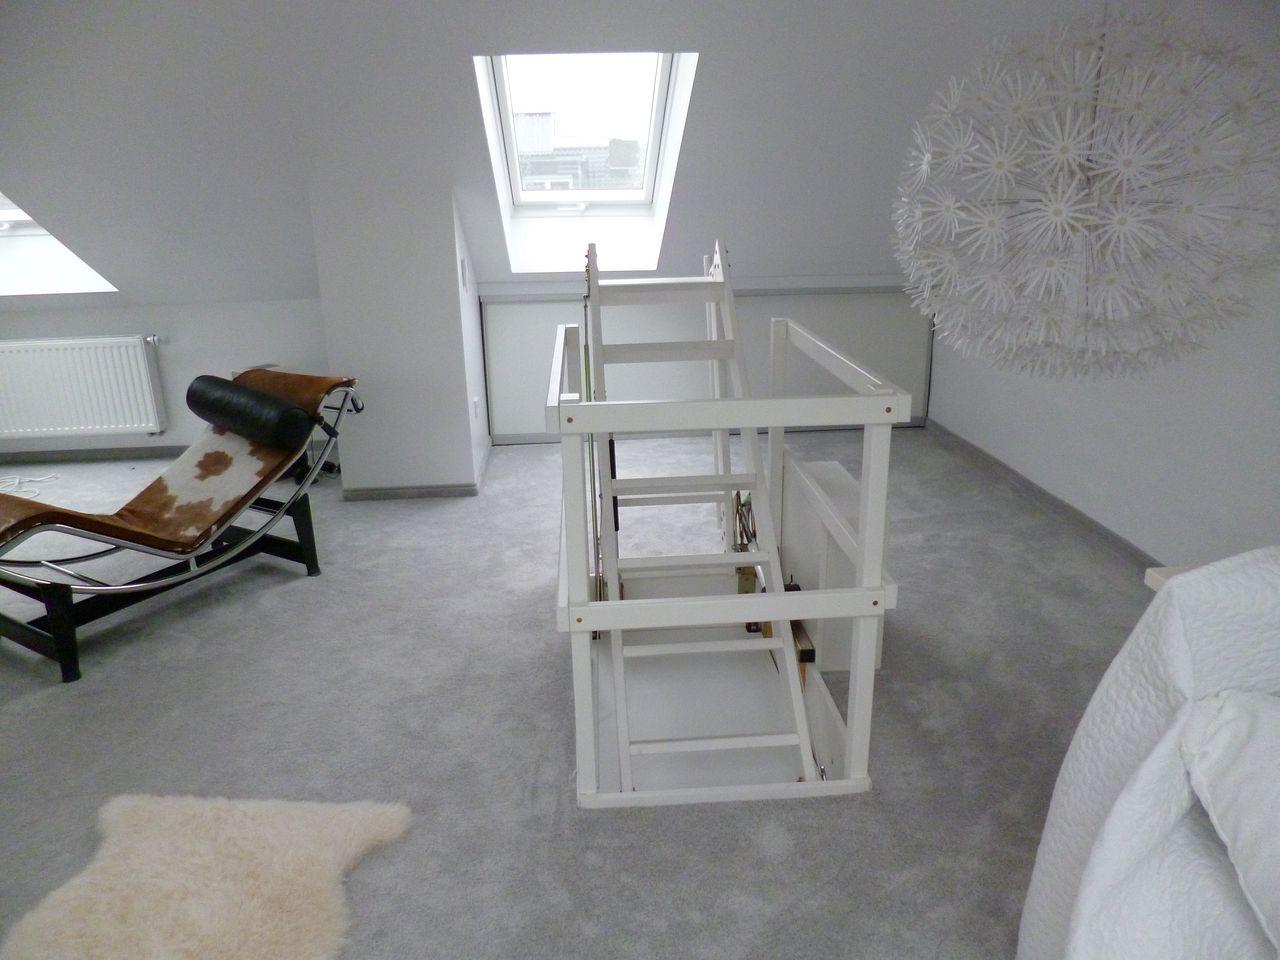 gallery of dachtreppe aluminium treppen dach etanco dachbodentreppe